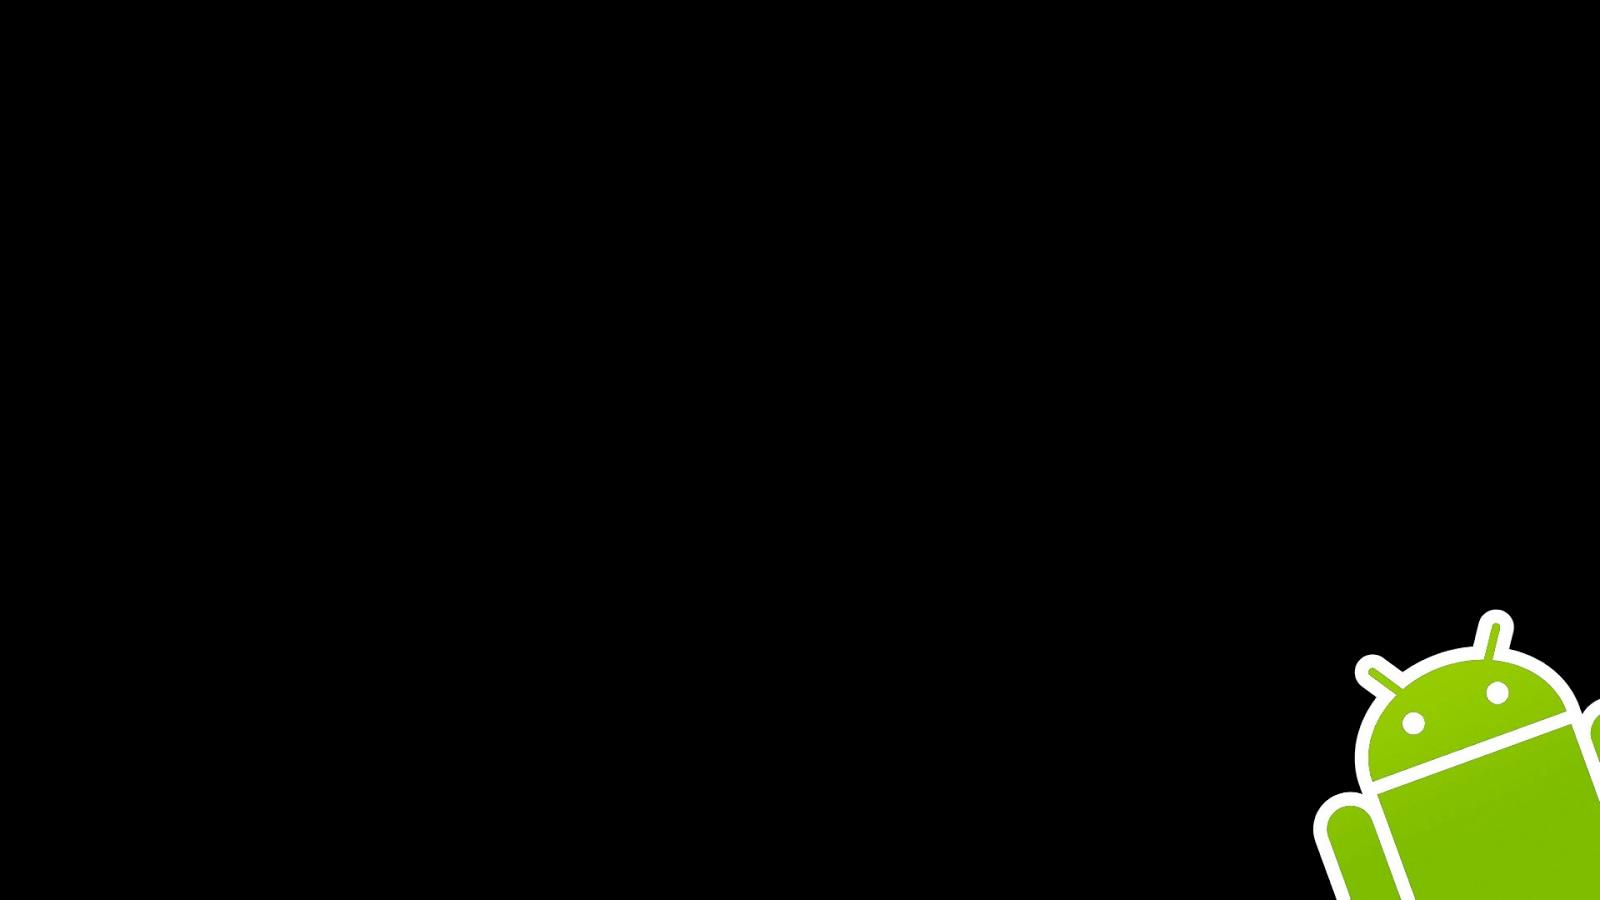 black wallpaper android all black wallpaper android rare black 1600x900